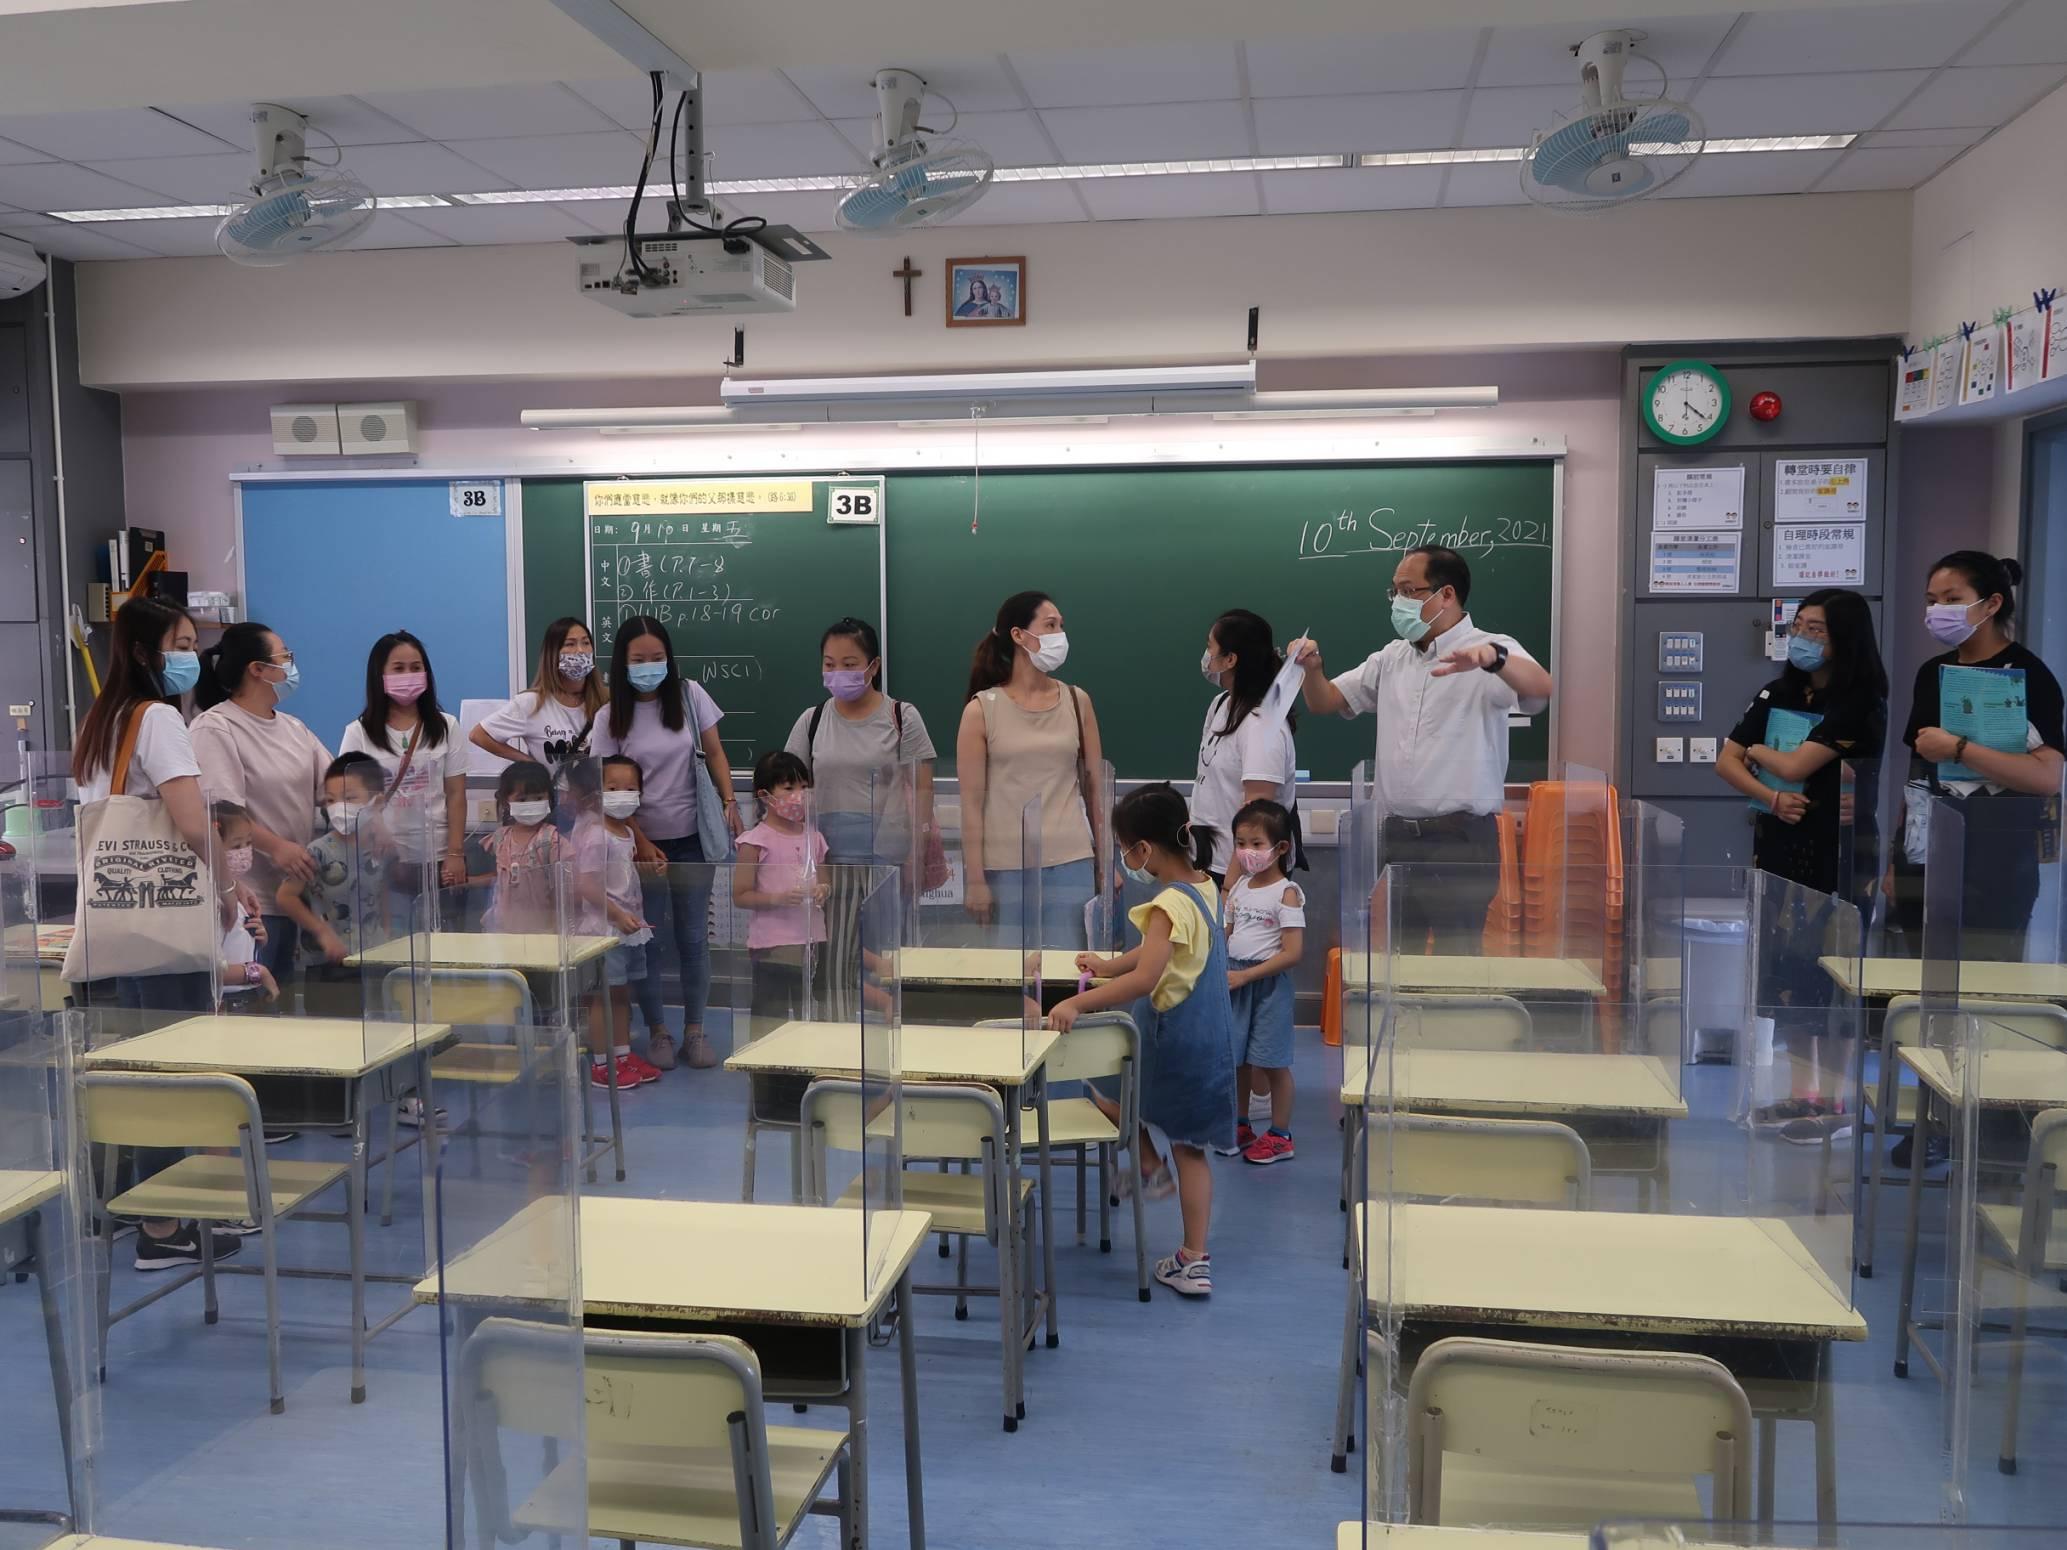 https://syh.edu.hk/sites/default/files/img_7461.jpg